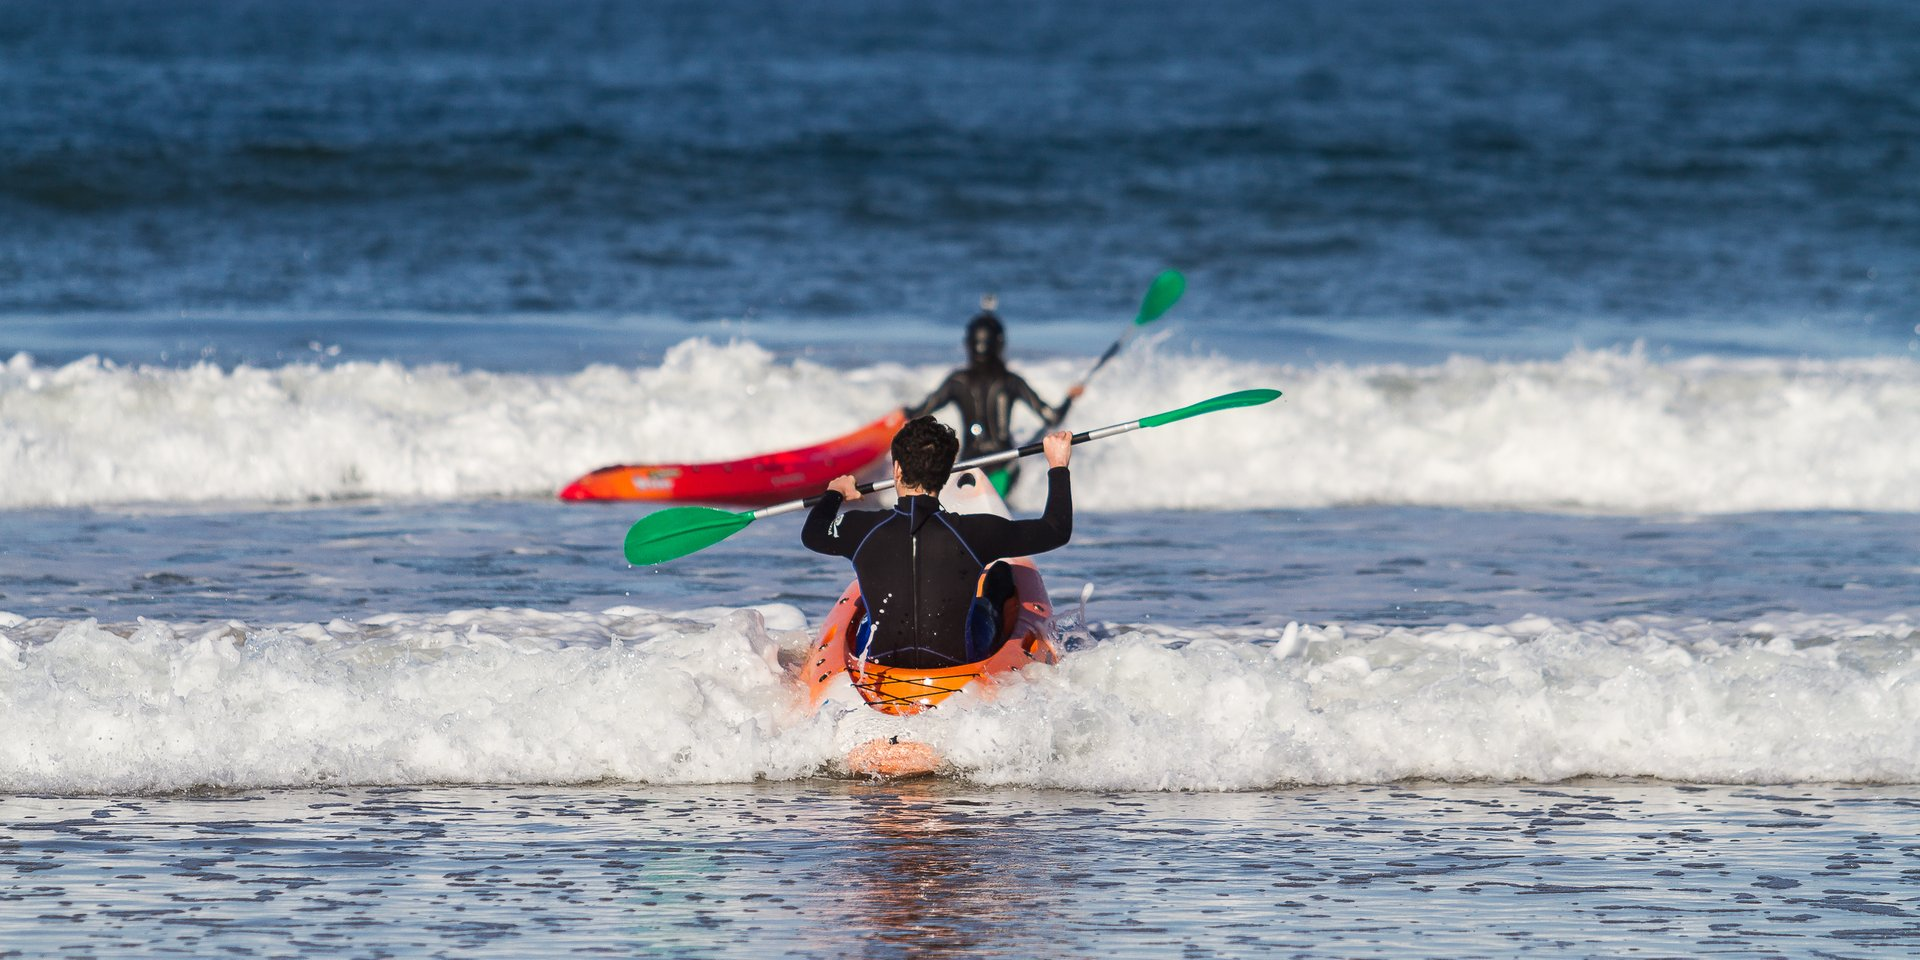 Kayaking in Galicia in Spain 2019 - Best Time